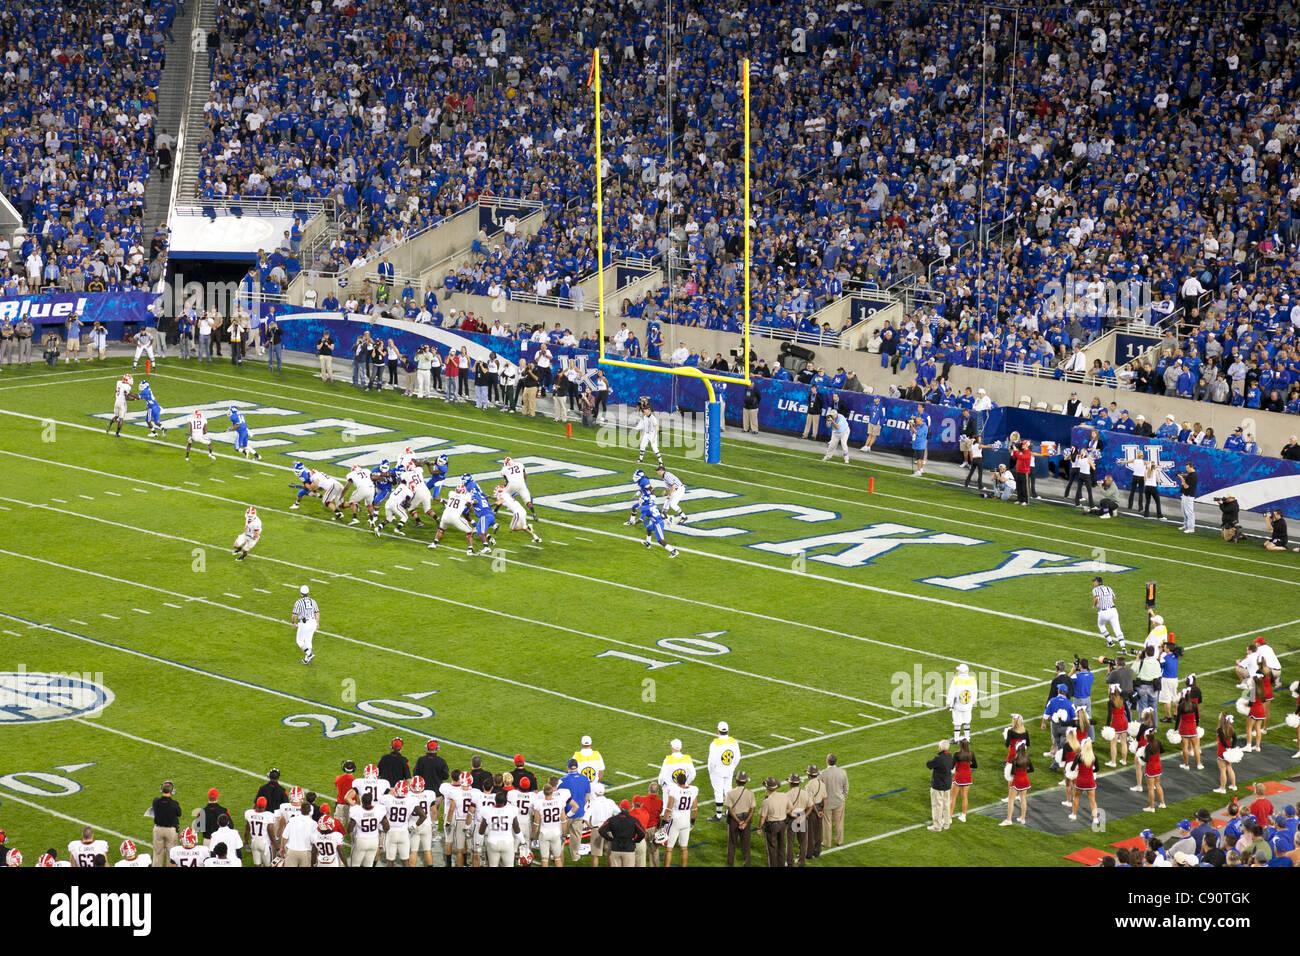 American Football Game Kentucky Wildcats against Georgia Bulldogs College team Lexington Kentucky United States - Stock Image